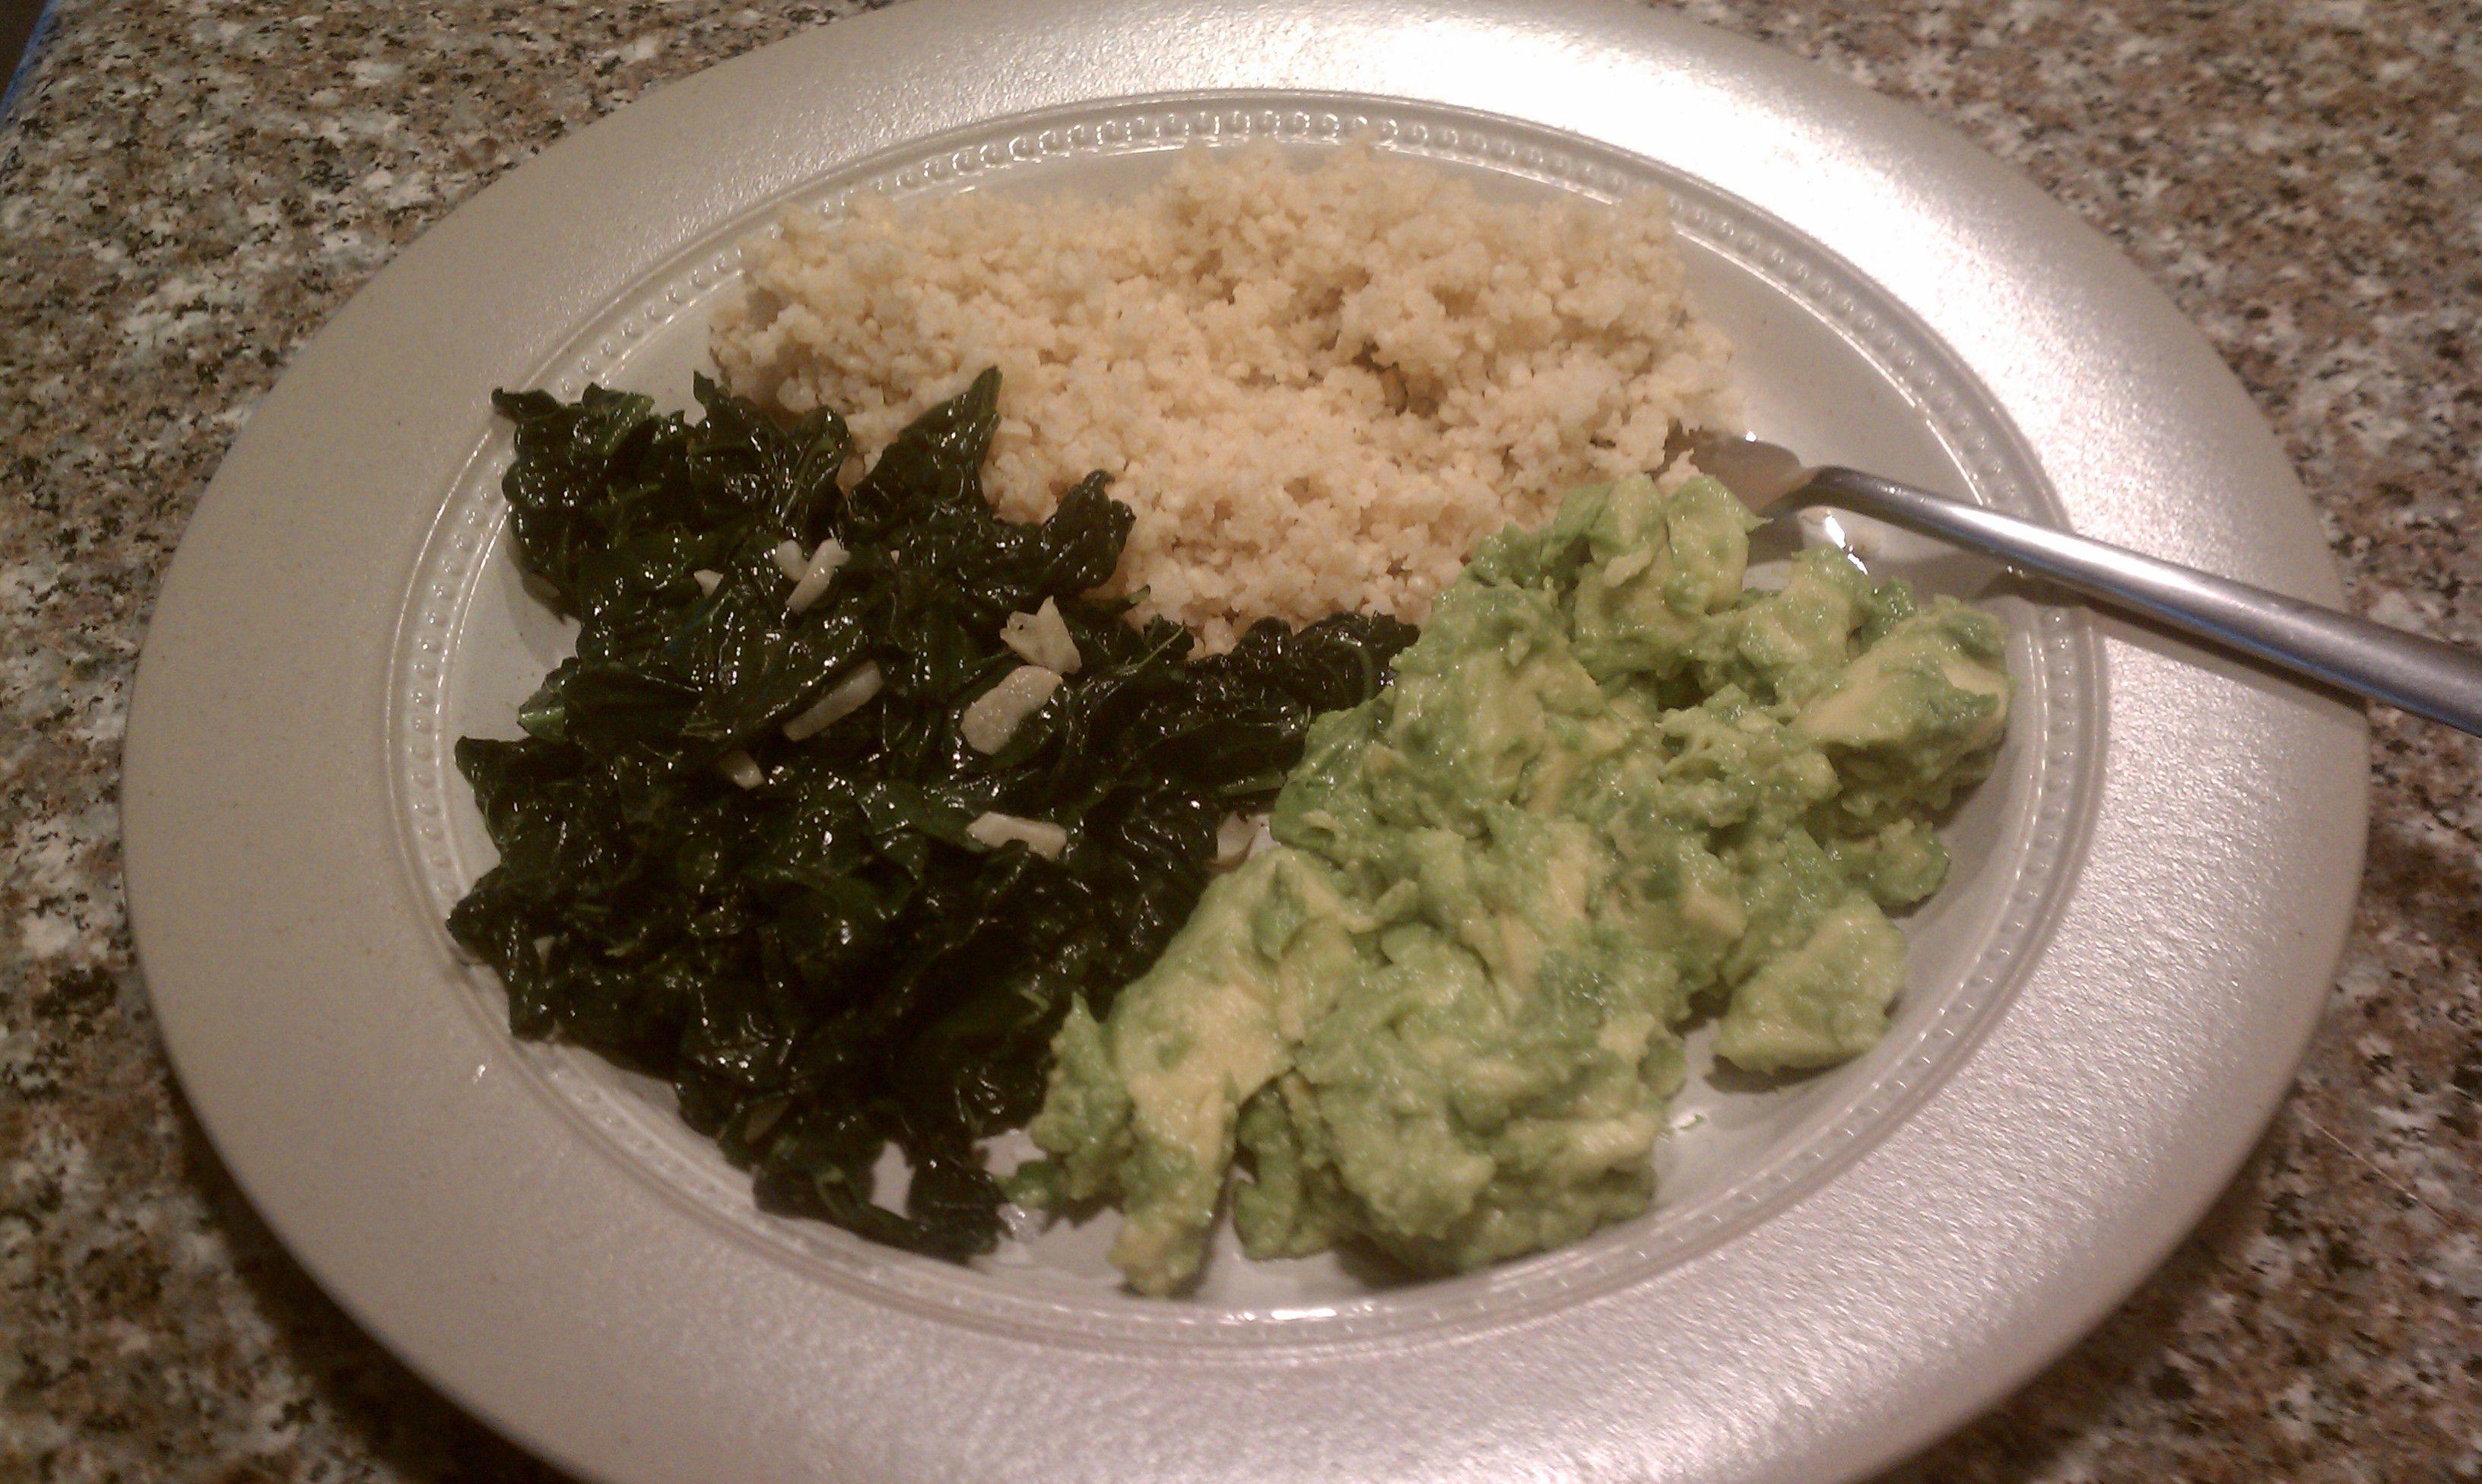 Avocado Mash With Quinoa and Sauteed Greens